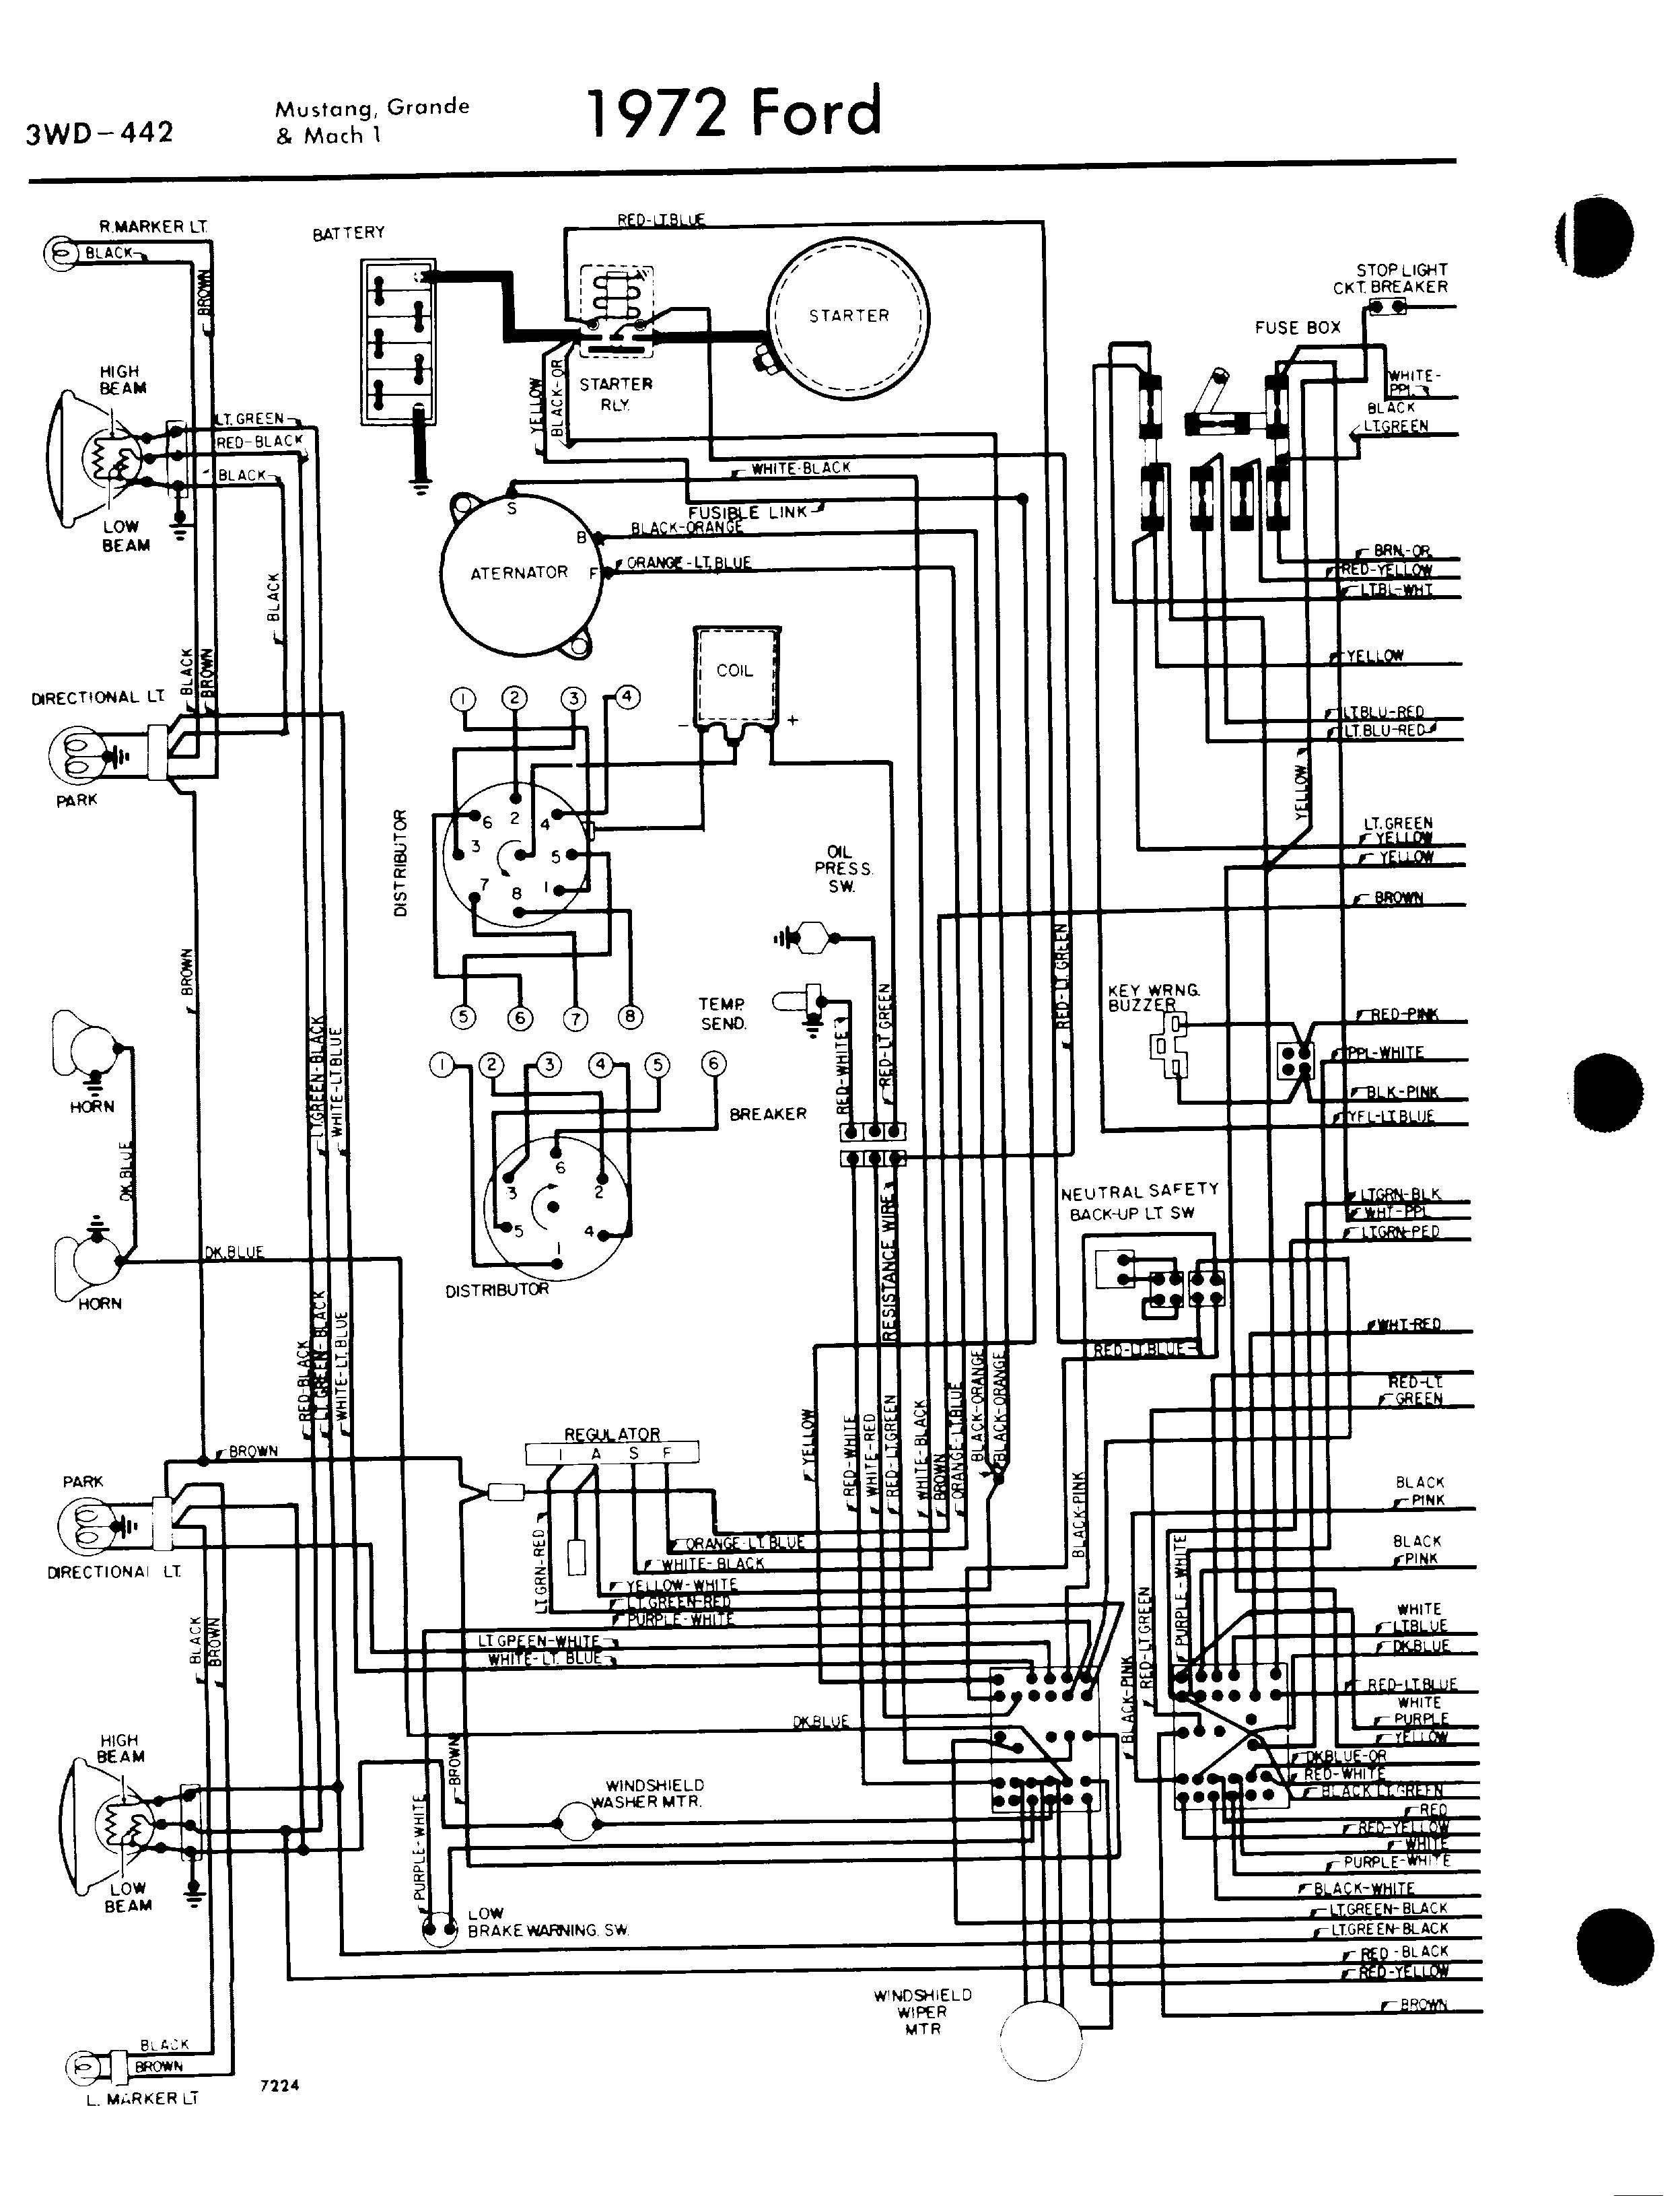 67 Mustang Horn Wiring Diagram